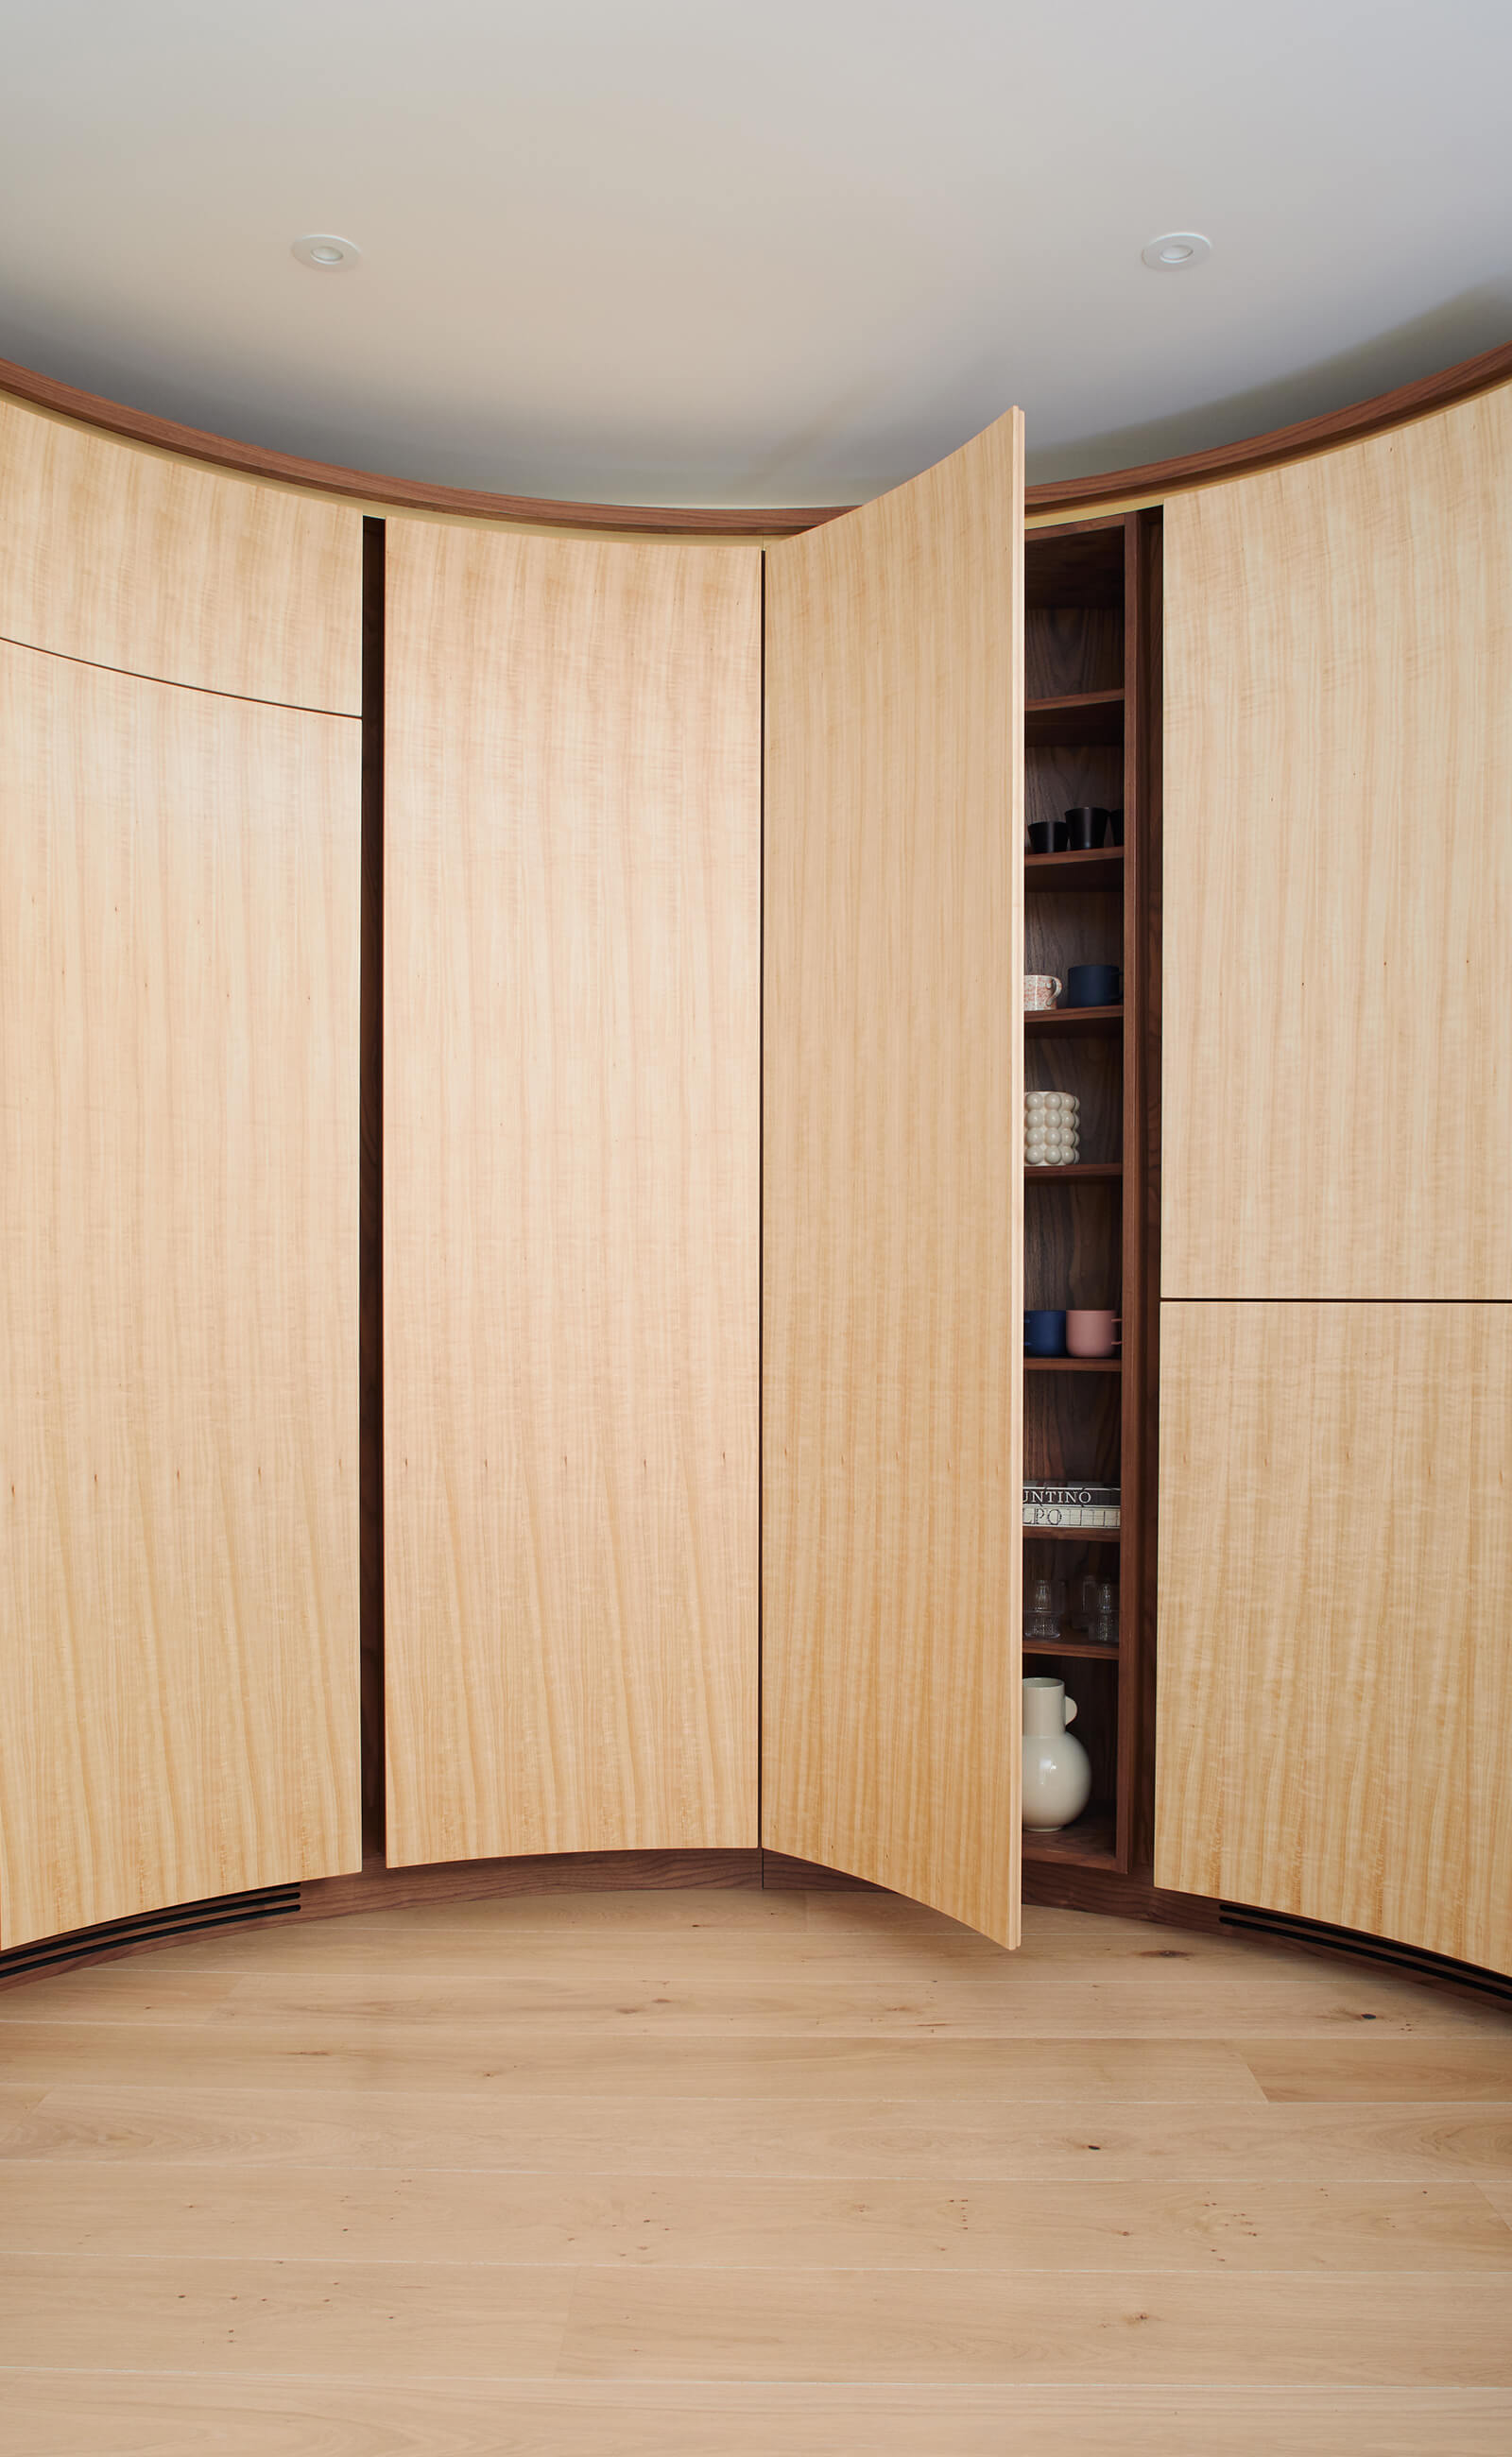 Thoughtful storage in contemporary circular kitchen designed by Splinterworks